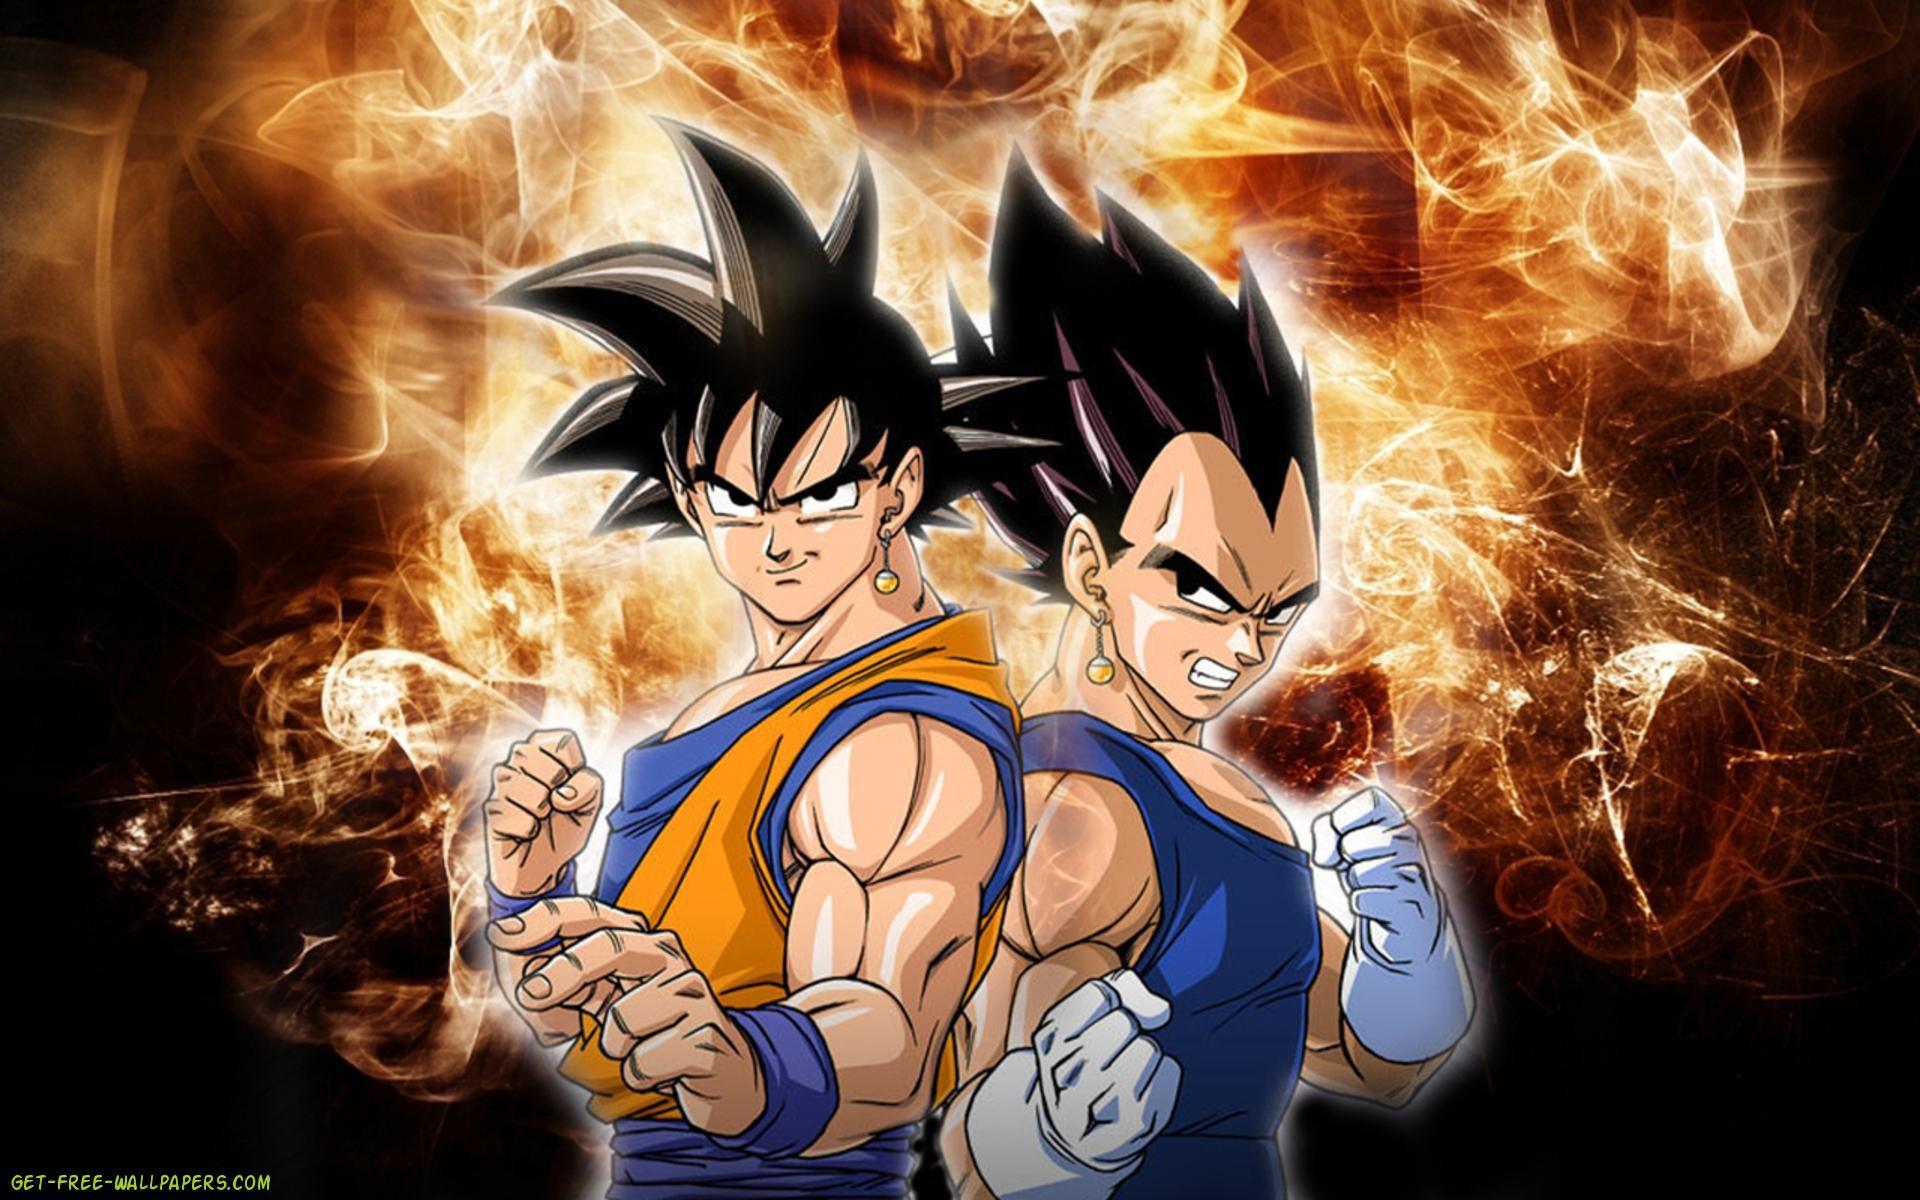 Free Download Vegeta and Goku Dragon Ball Z Wallpaper .